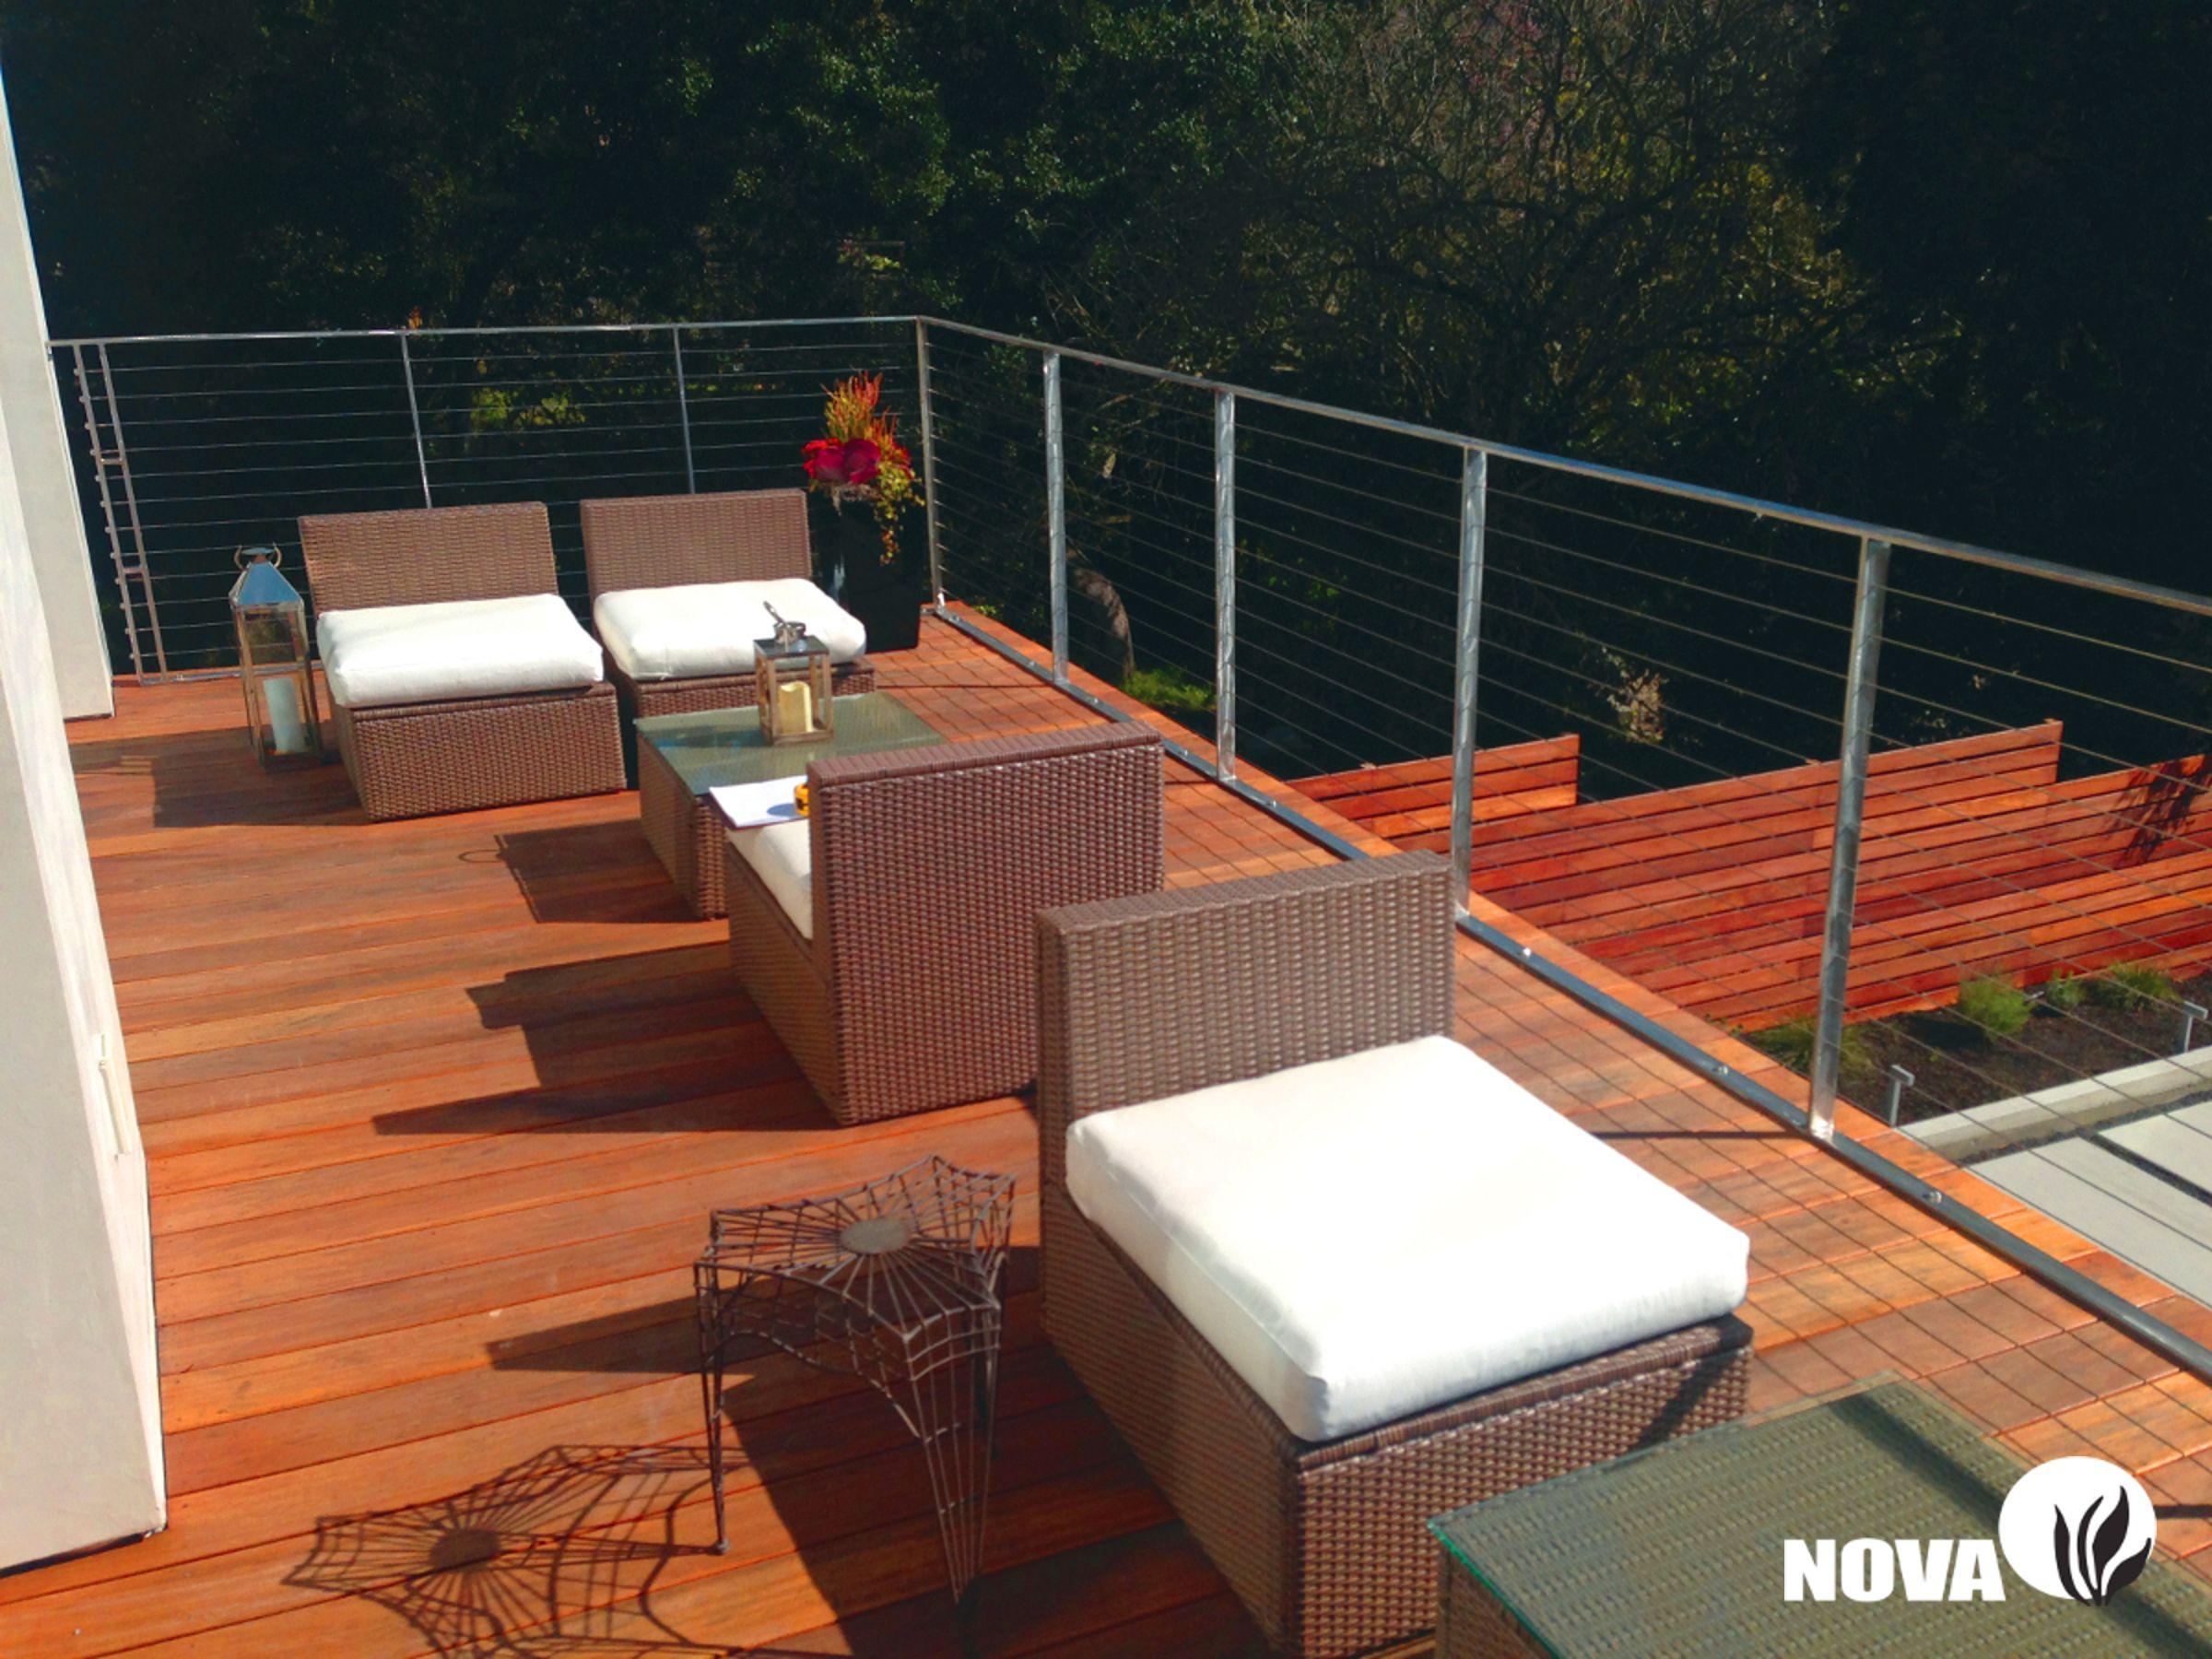 Vibrant Nova Batu hardwood deck built on